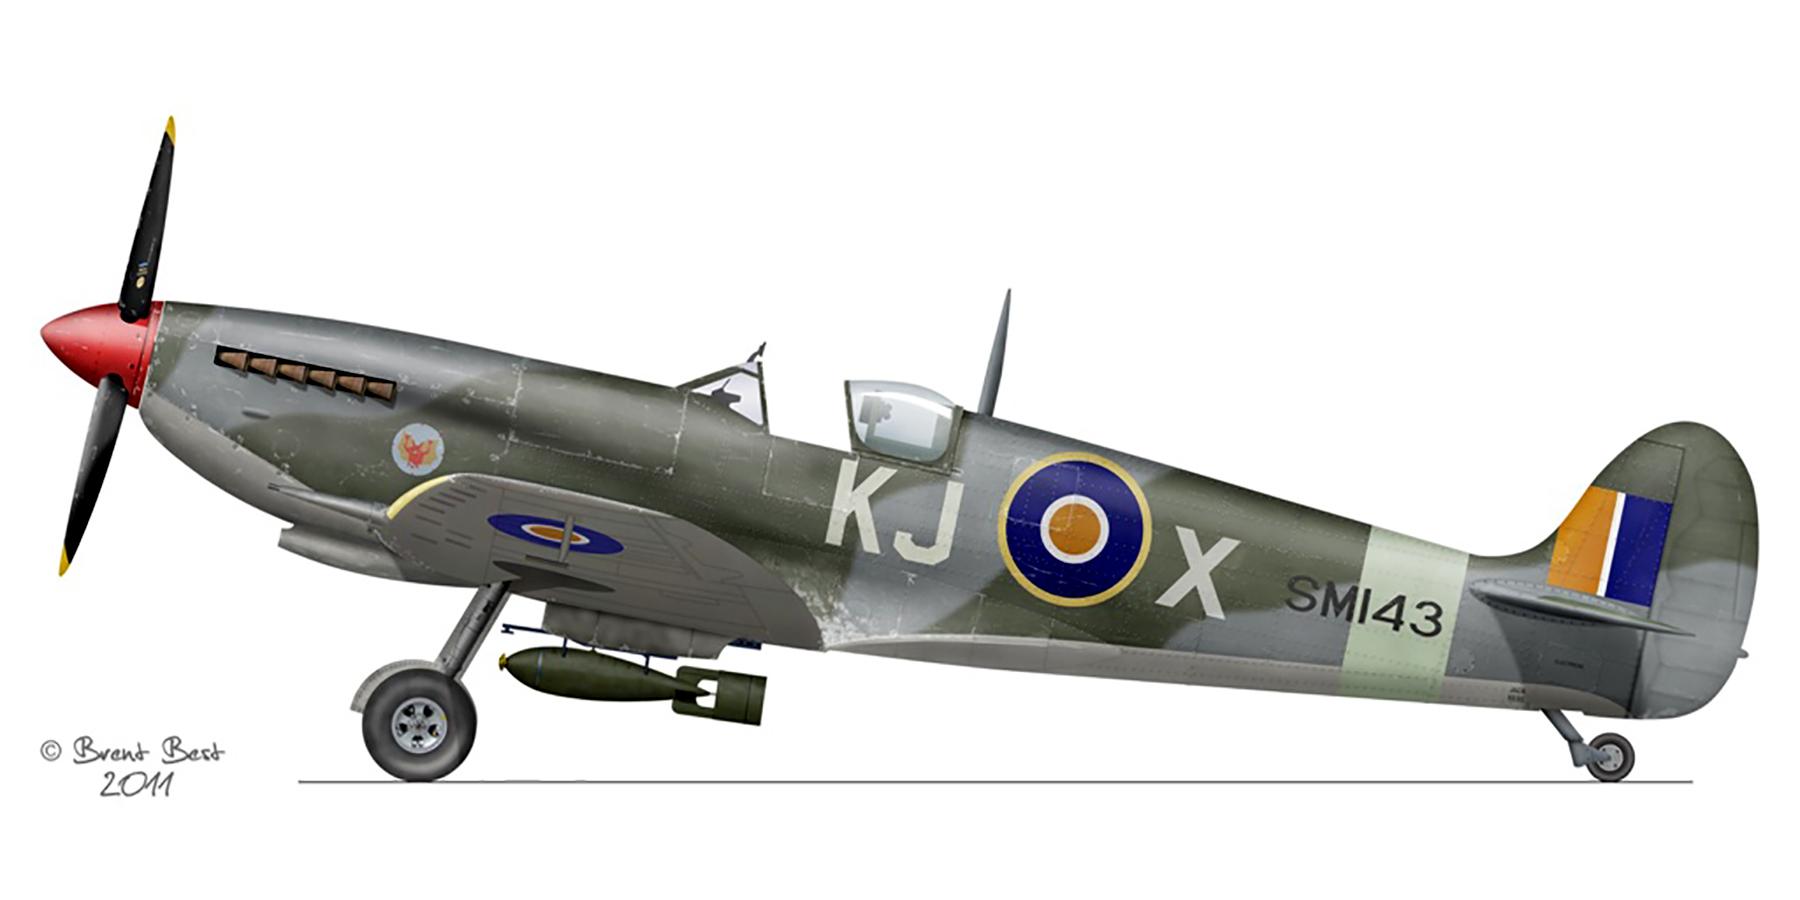 Spitfire LFIX SAAF 4Sqn KJX SM143 Italy 1945 0A